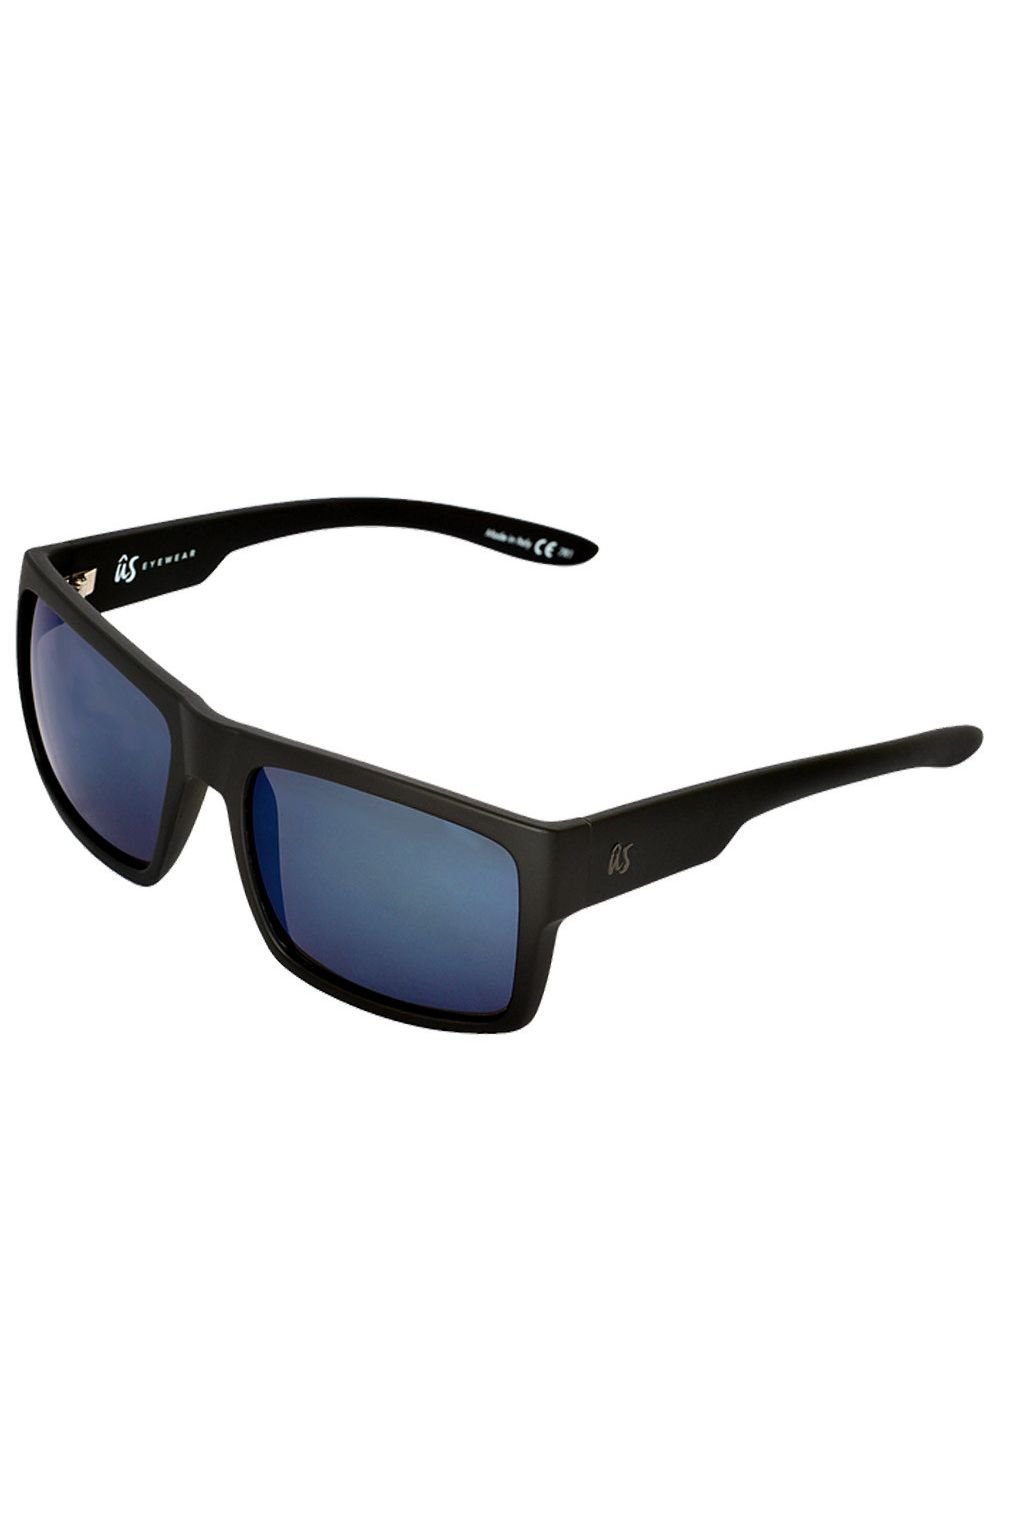 Oculos US HELIOS Matte Black/Grey Blue Chrome